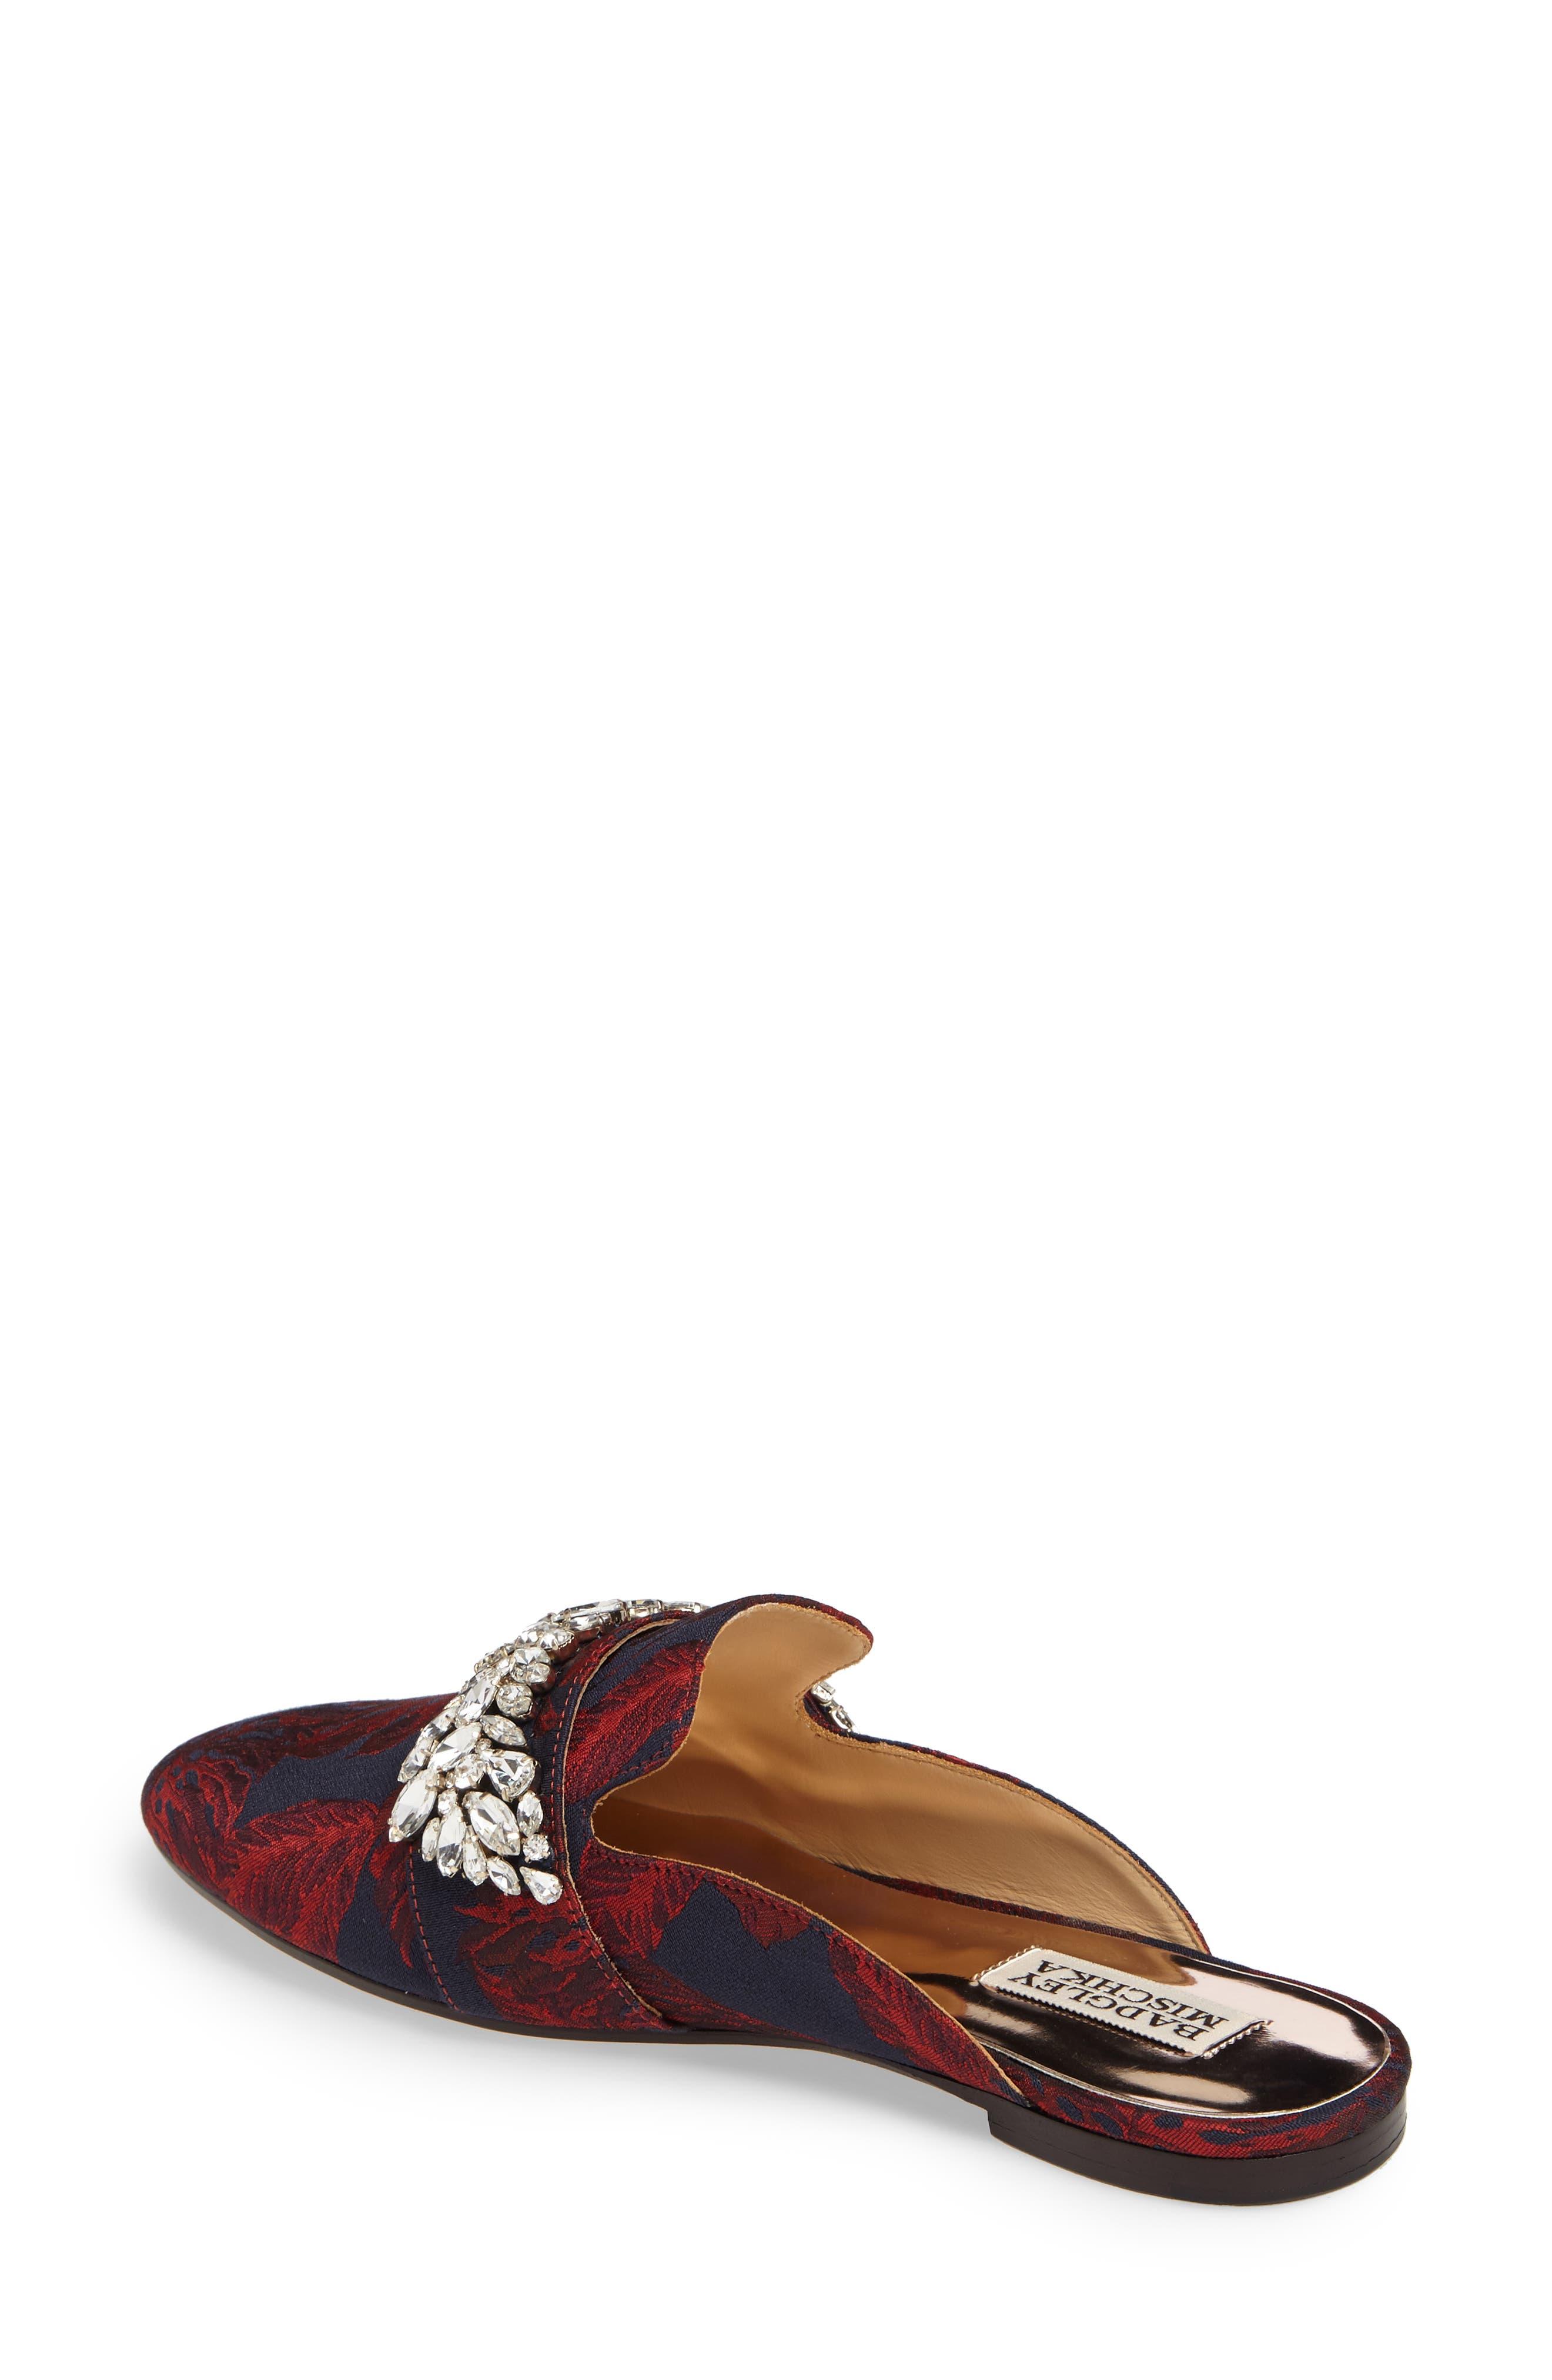 Kana Embellished Loafer Mule,                             Alternate thumbnail 2, color,                             Burgundy Fabric